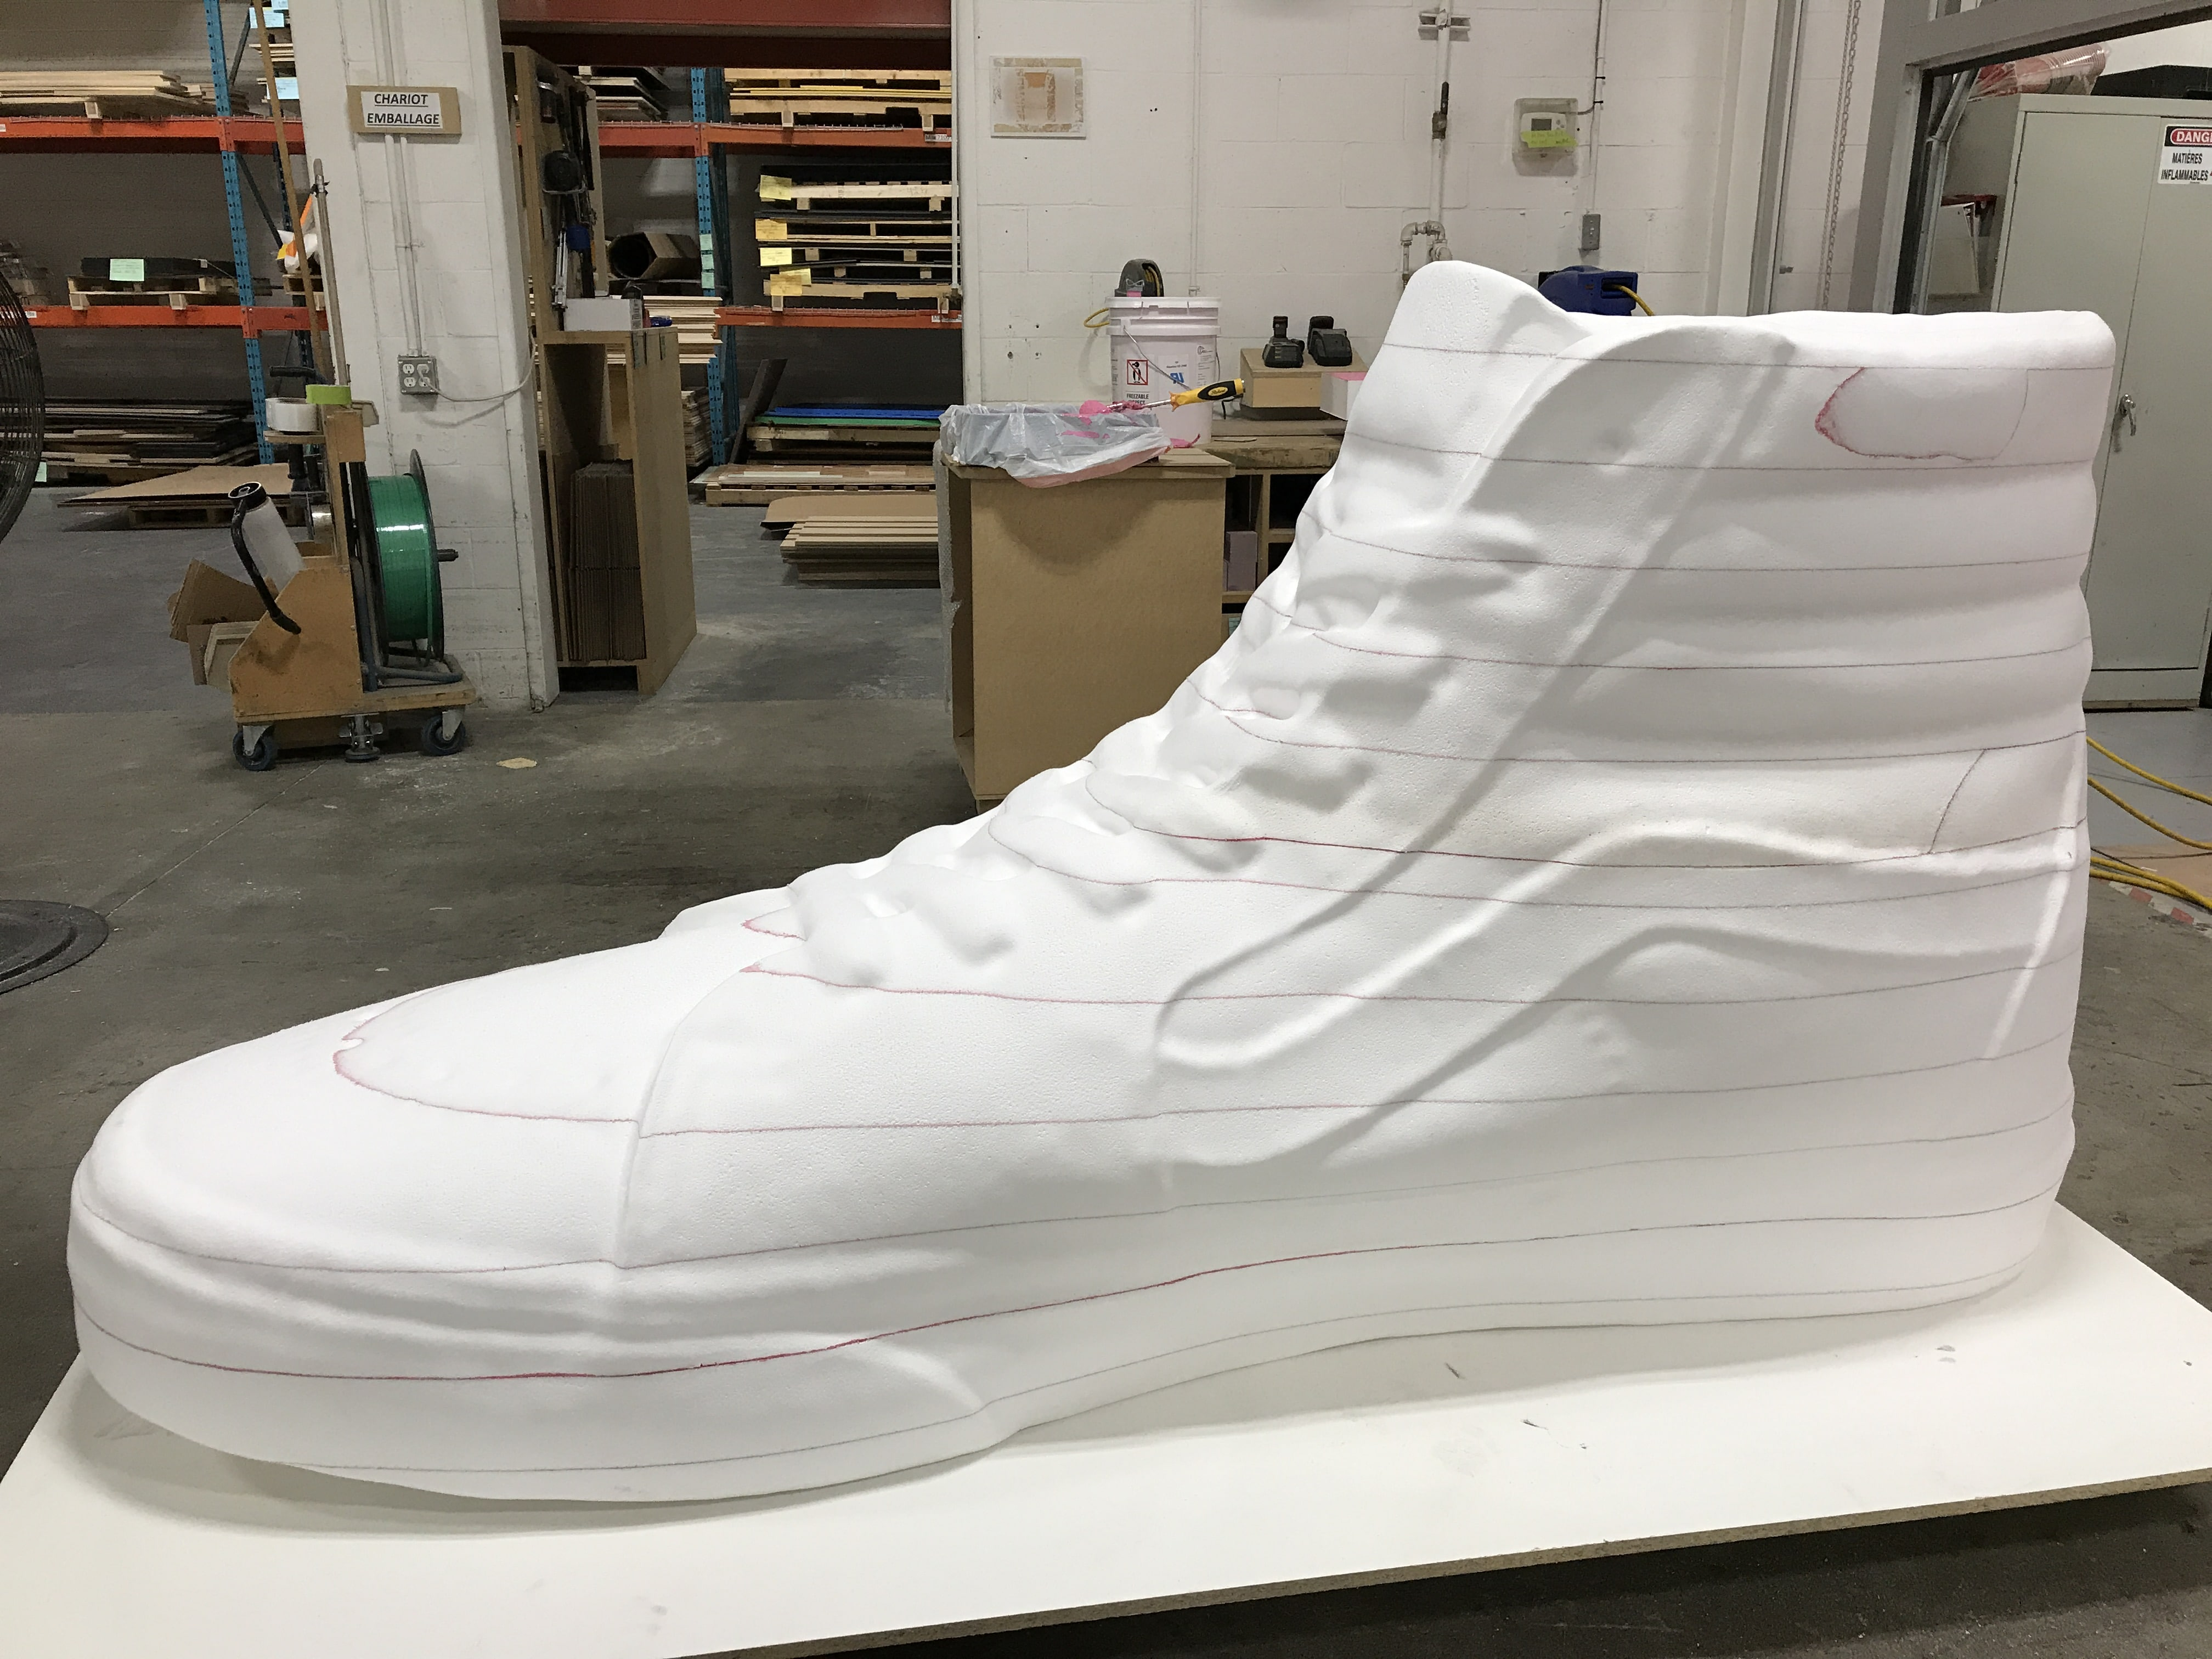 soulier polystyrène côté